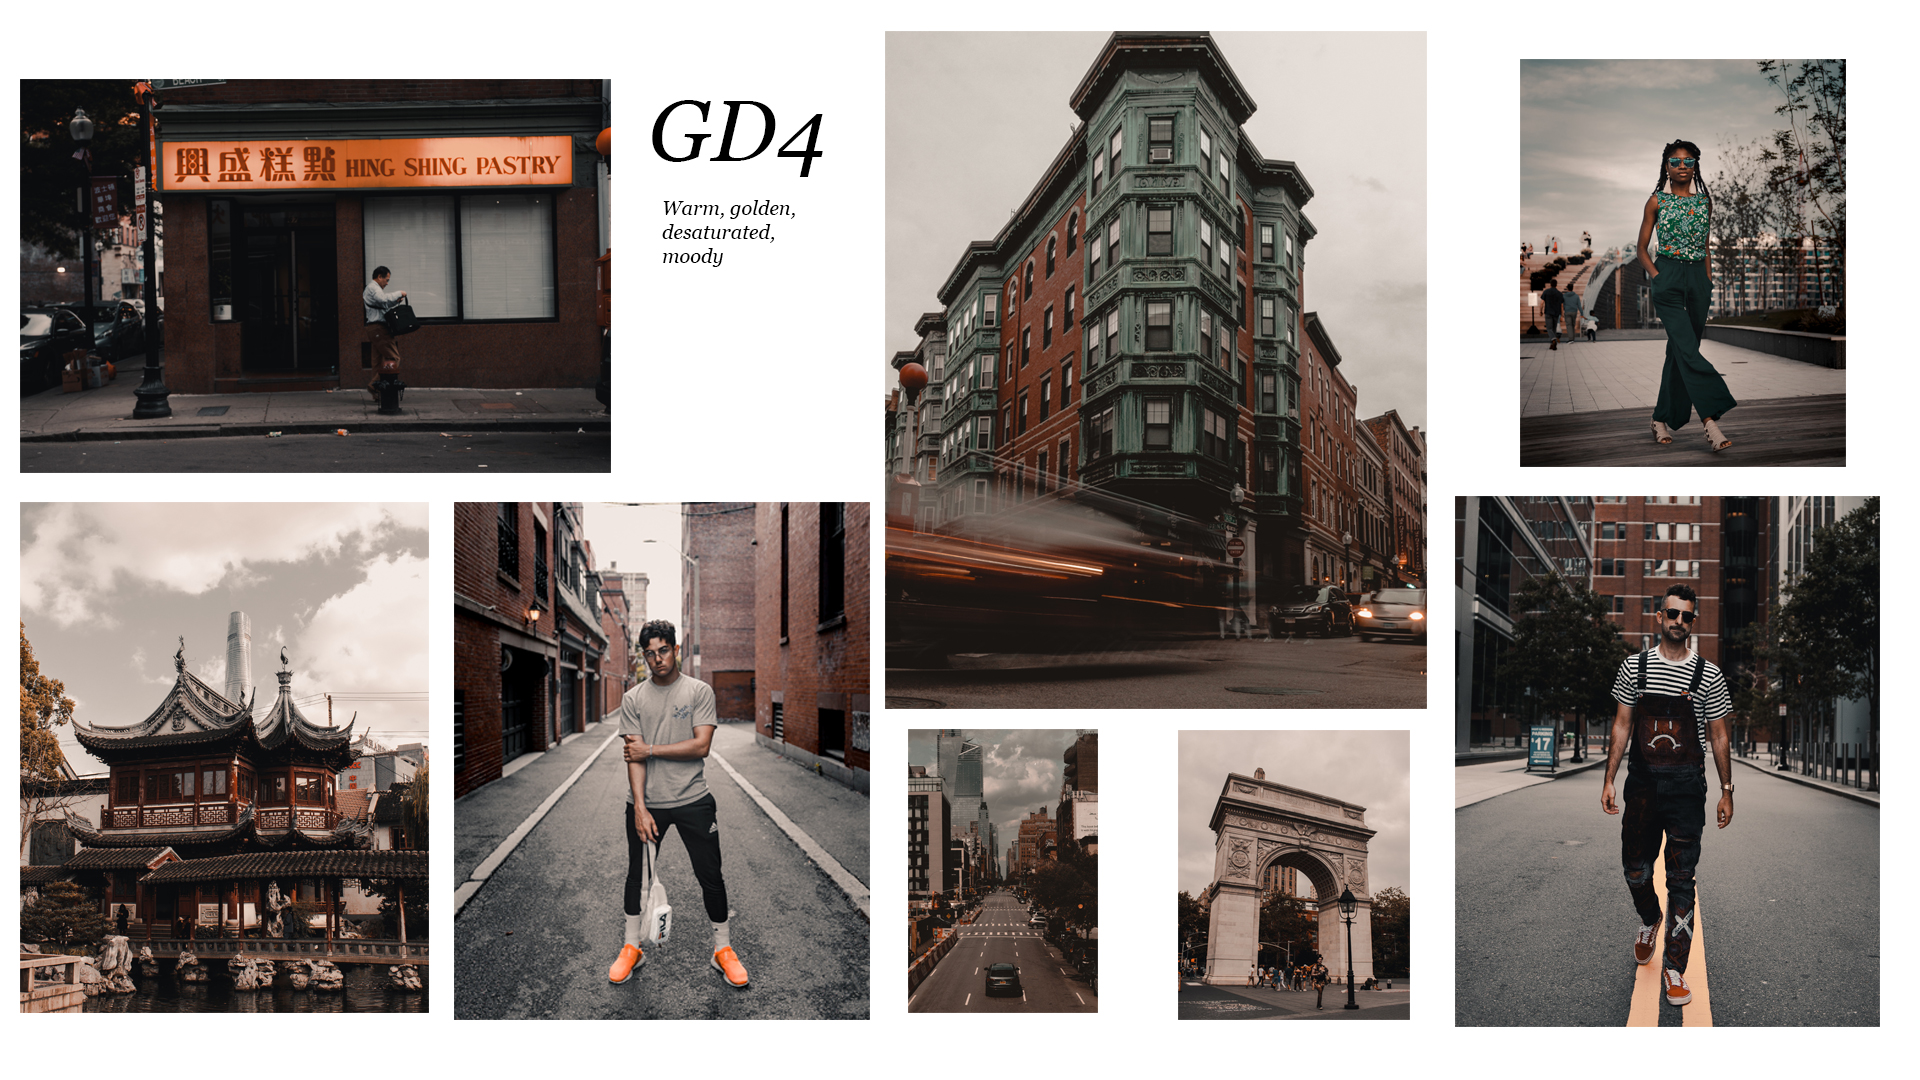 GD4preset.jpg